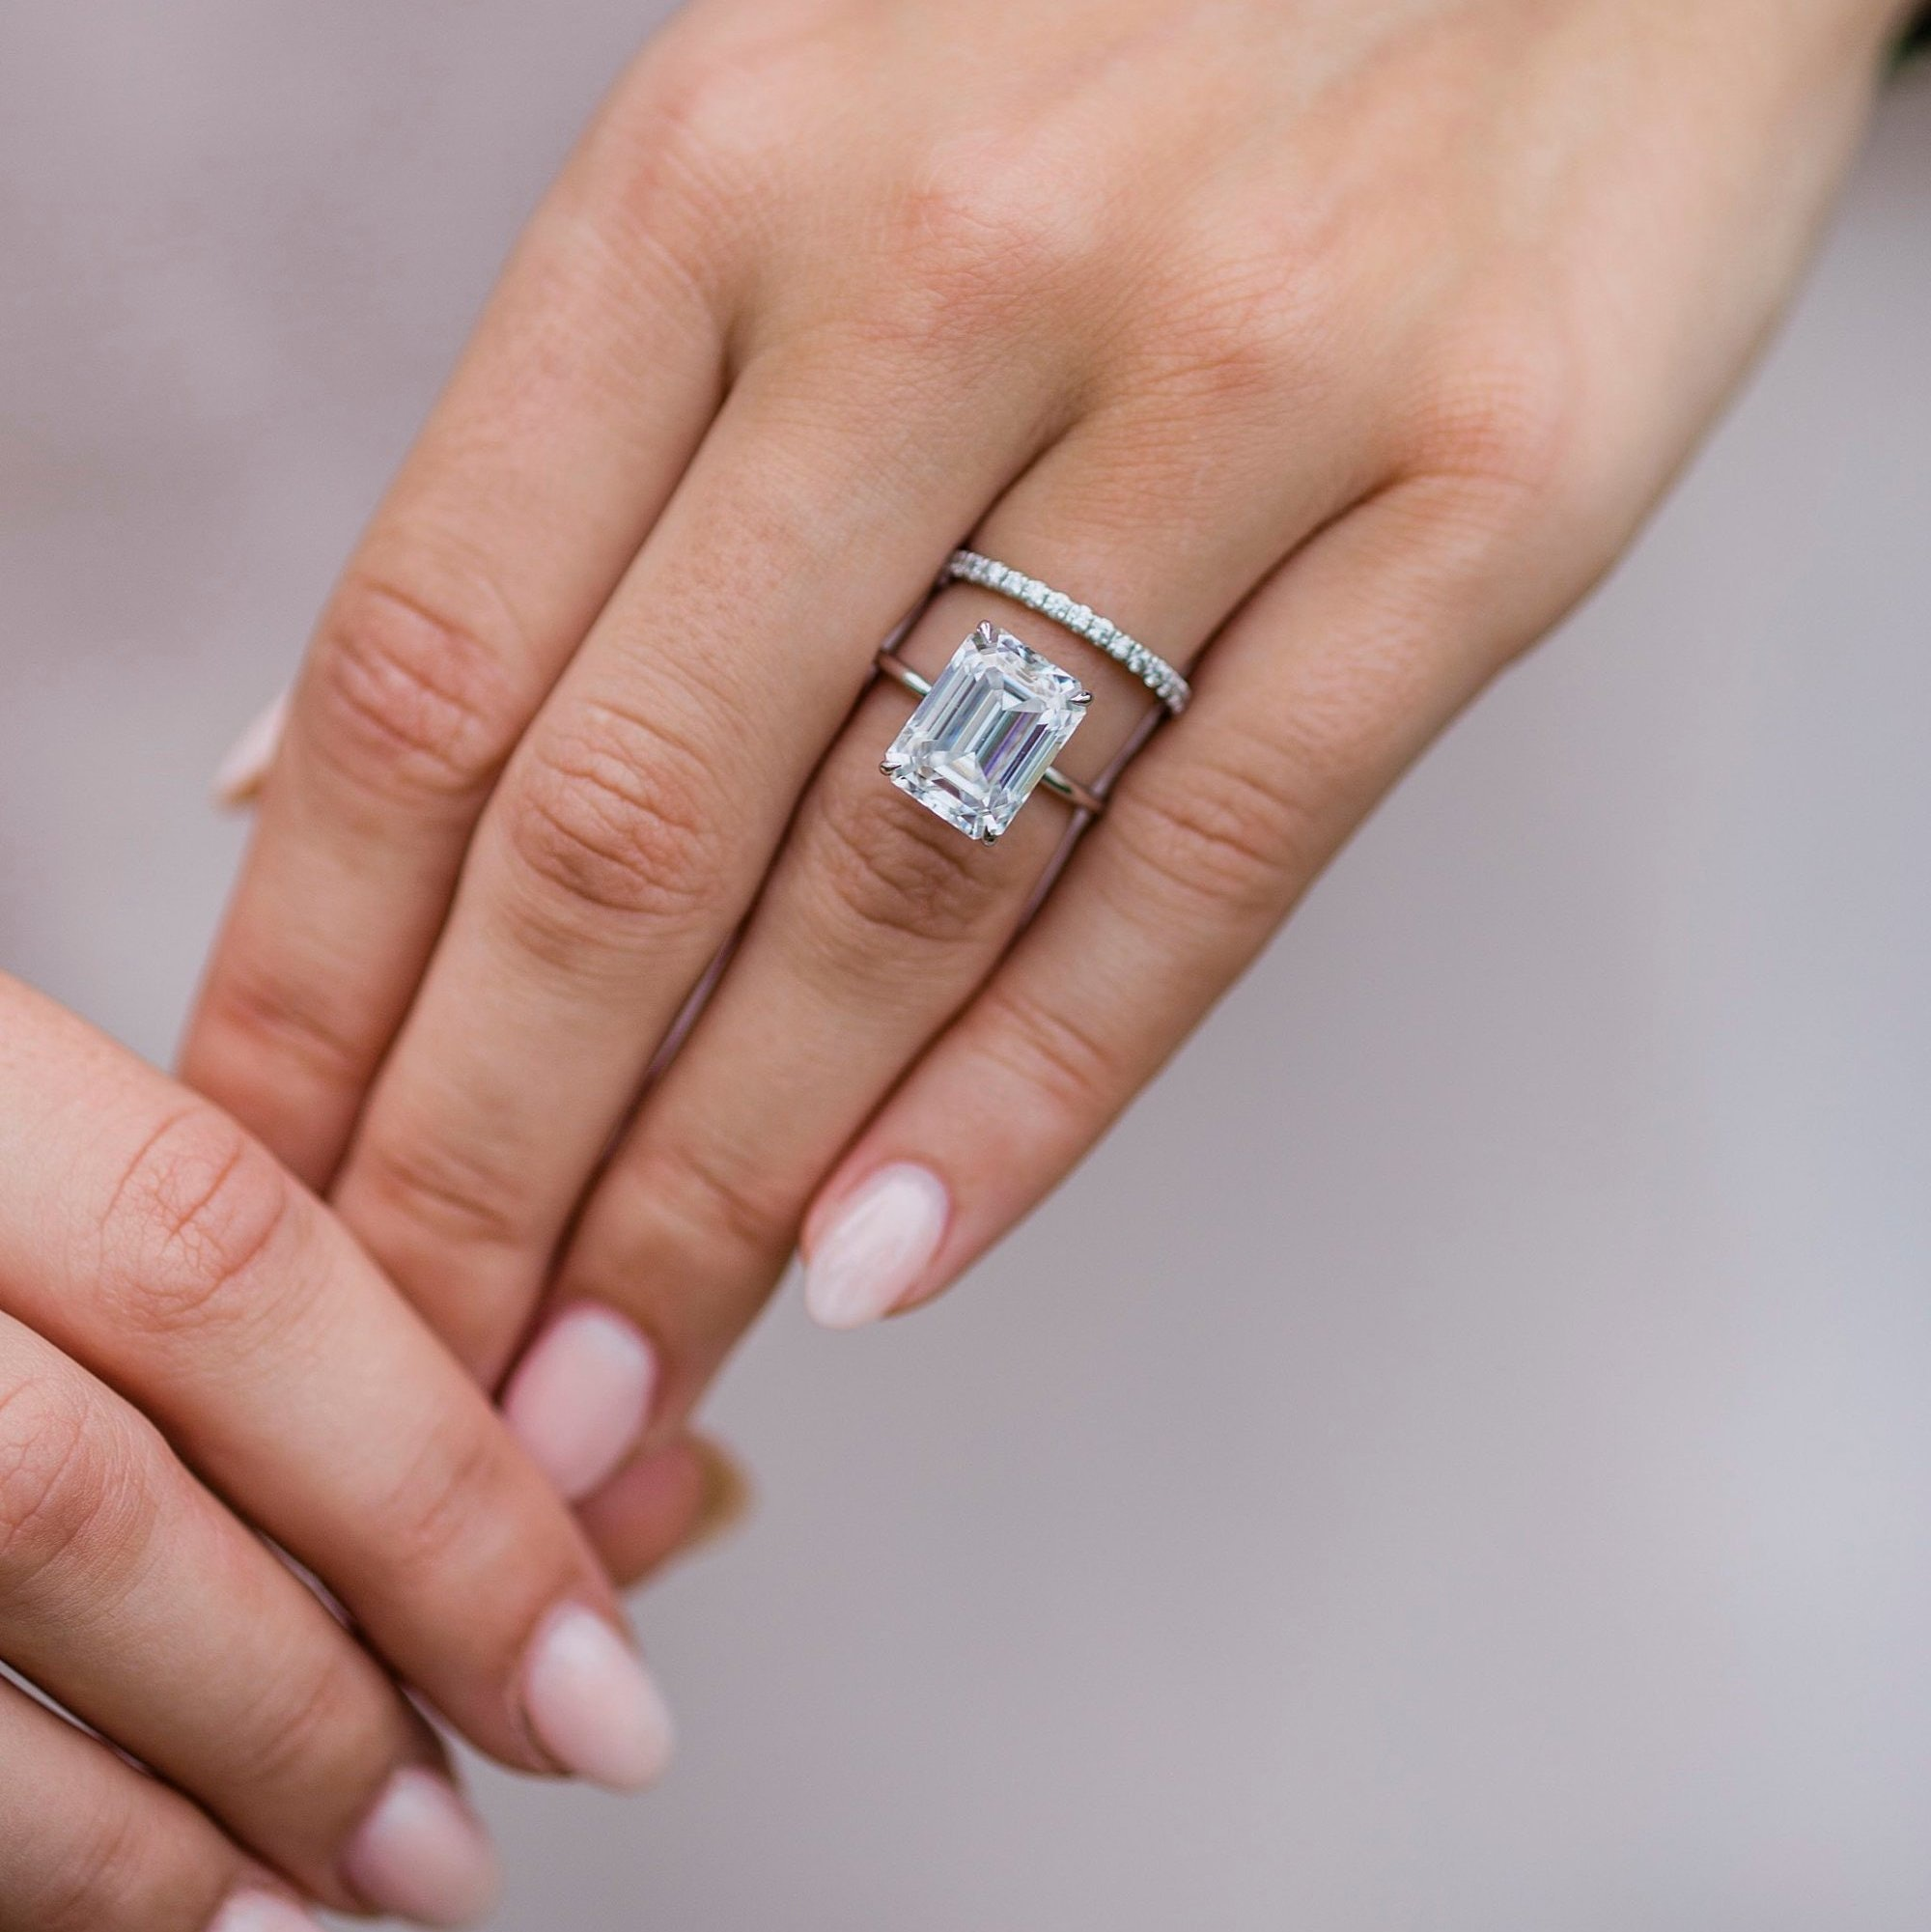 Moissanite Engagement Rings Are The Popular Diamond